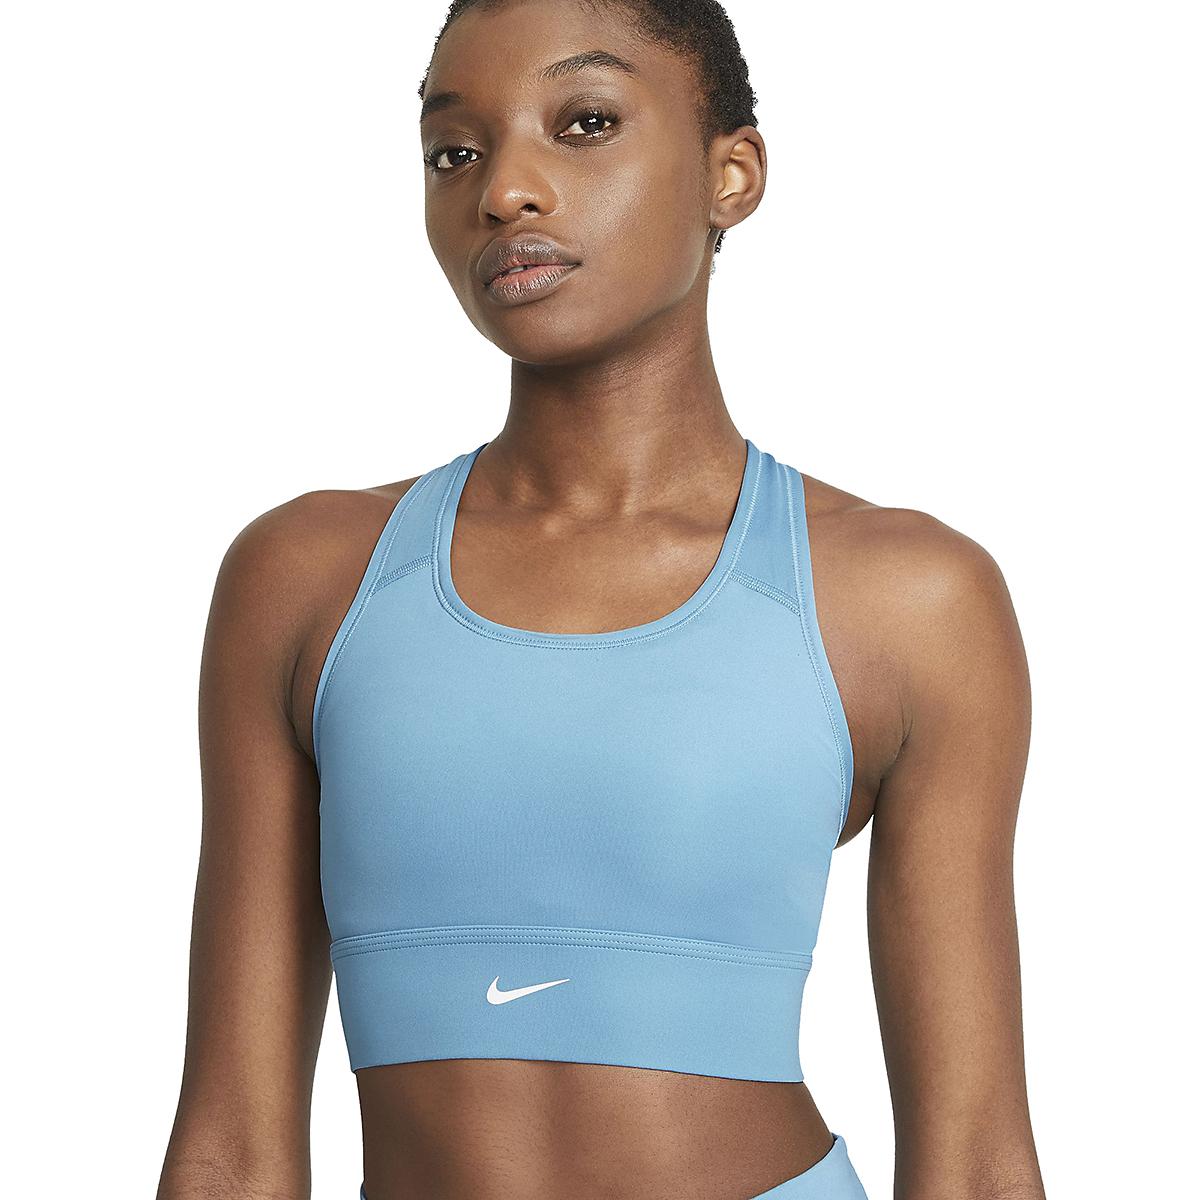 Women's Nike Swoosh Long Line Bra, , large, image 3